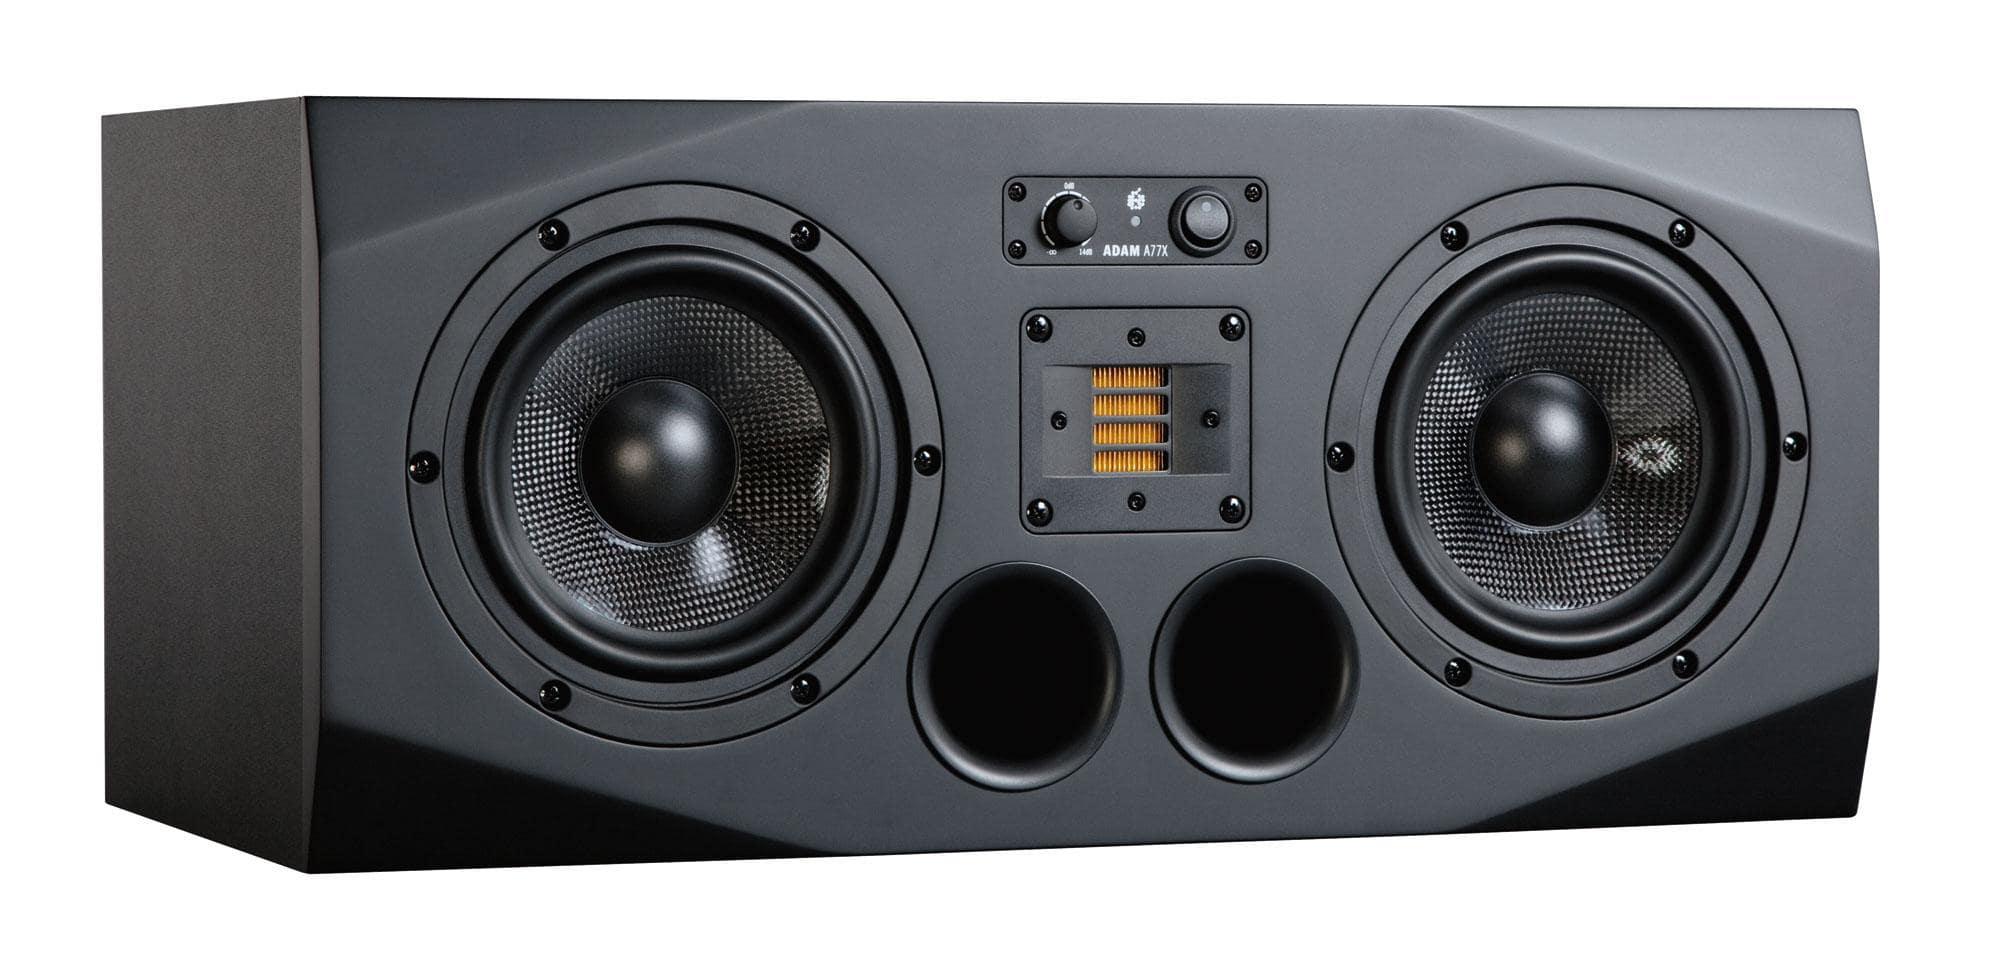 Studiomonitore - Adam Audio A77X (B) - Onlineshop Musikhaus Kirstein